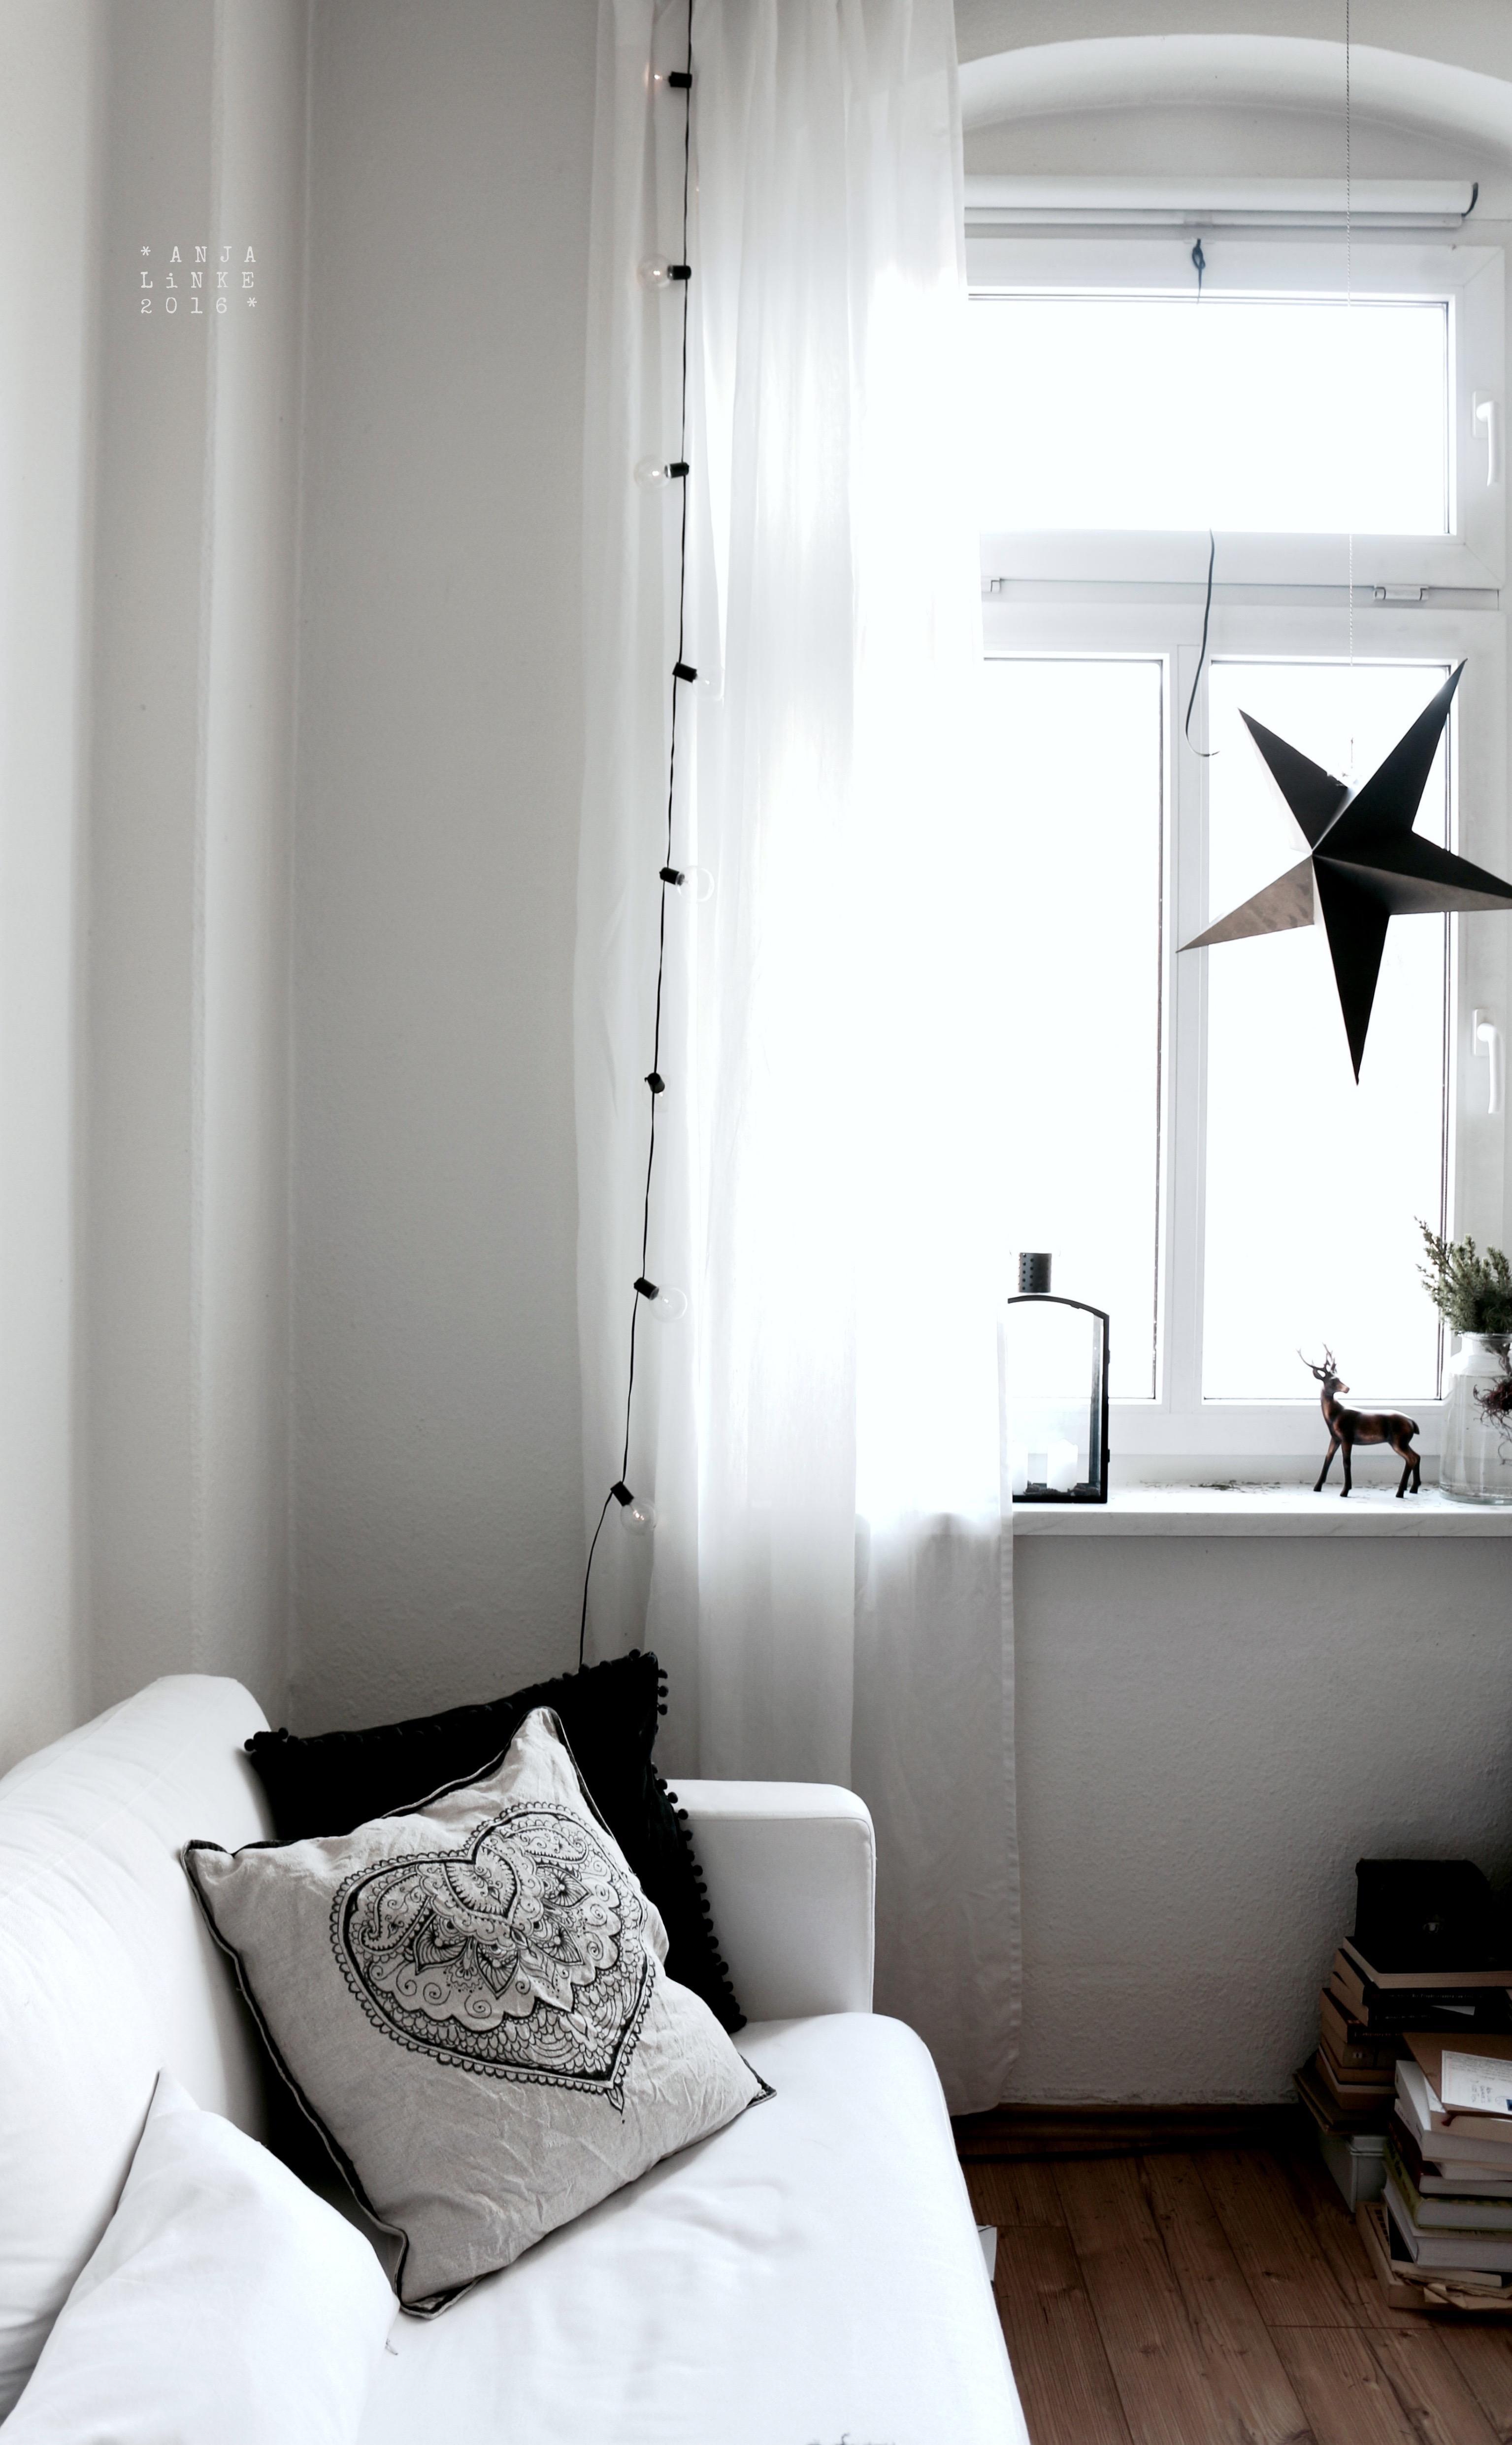 Dezember Wohnzimmer Altbau Diy Kissen Ikea Laminat CAnja Linke